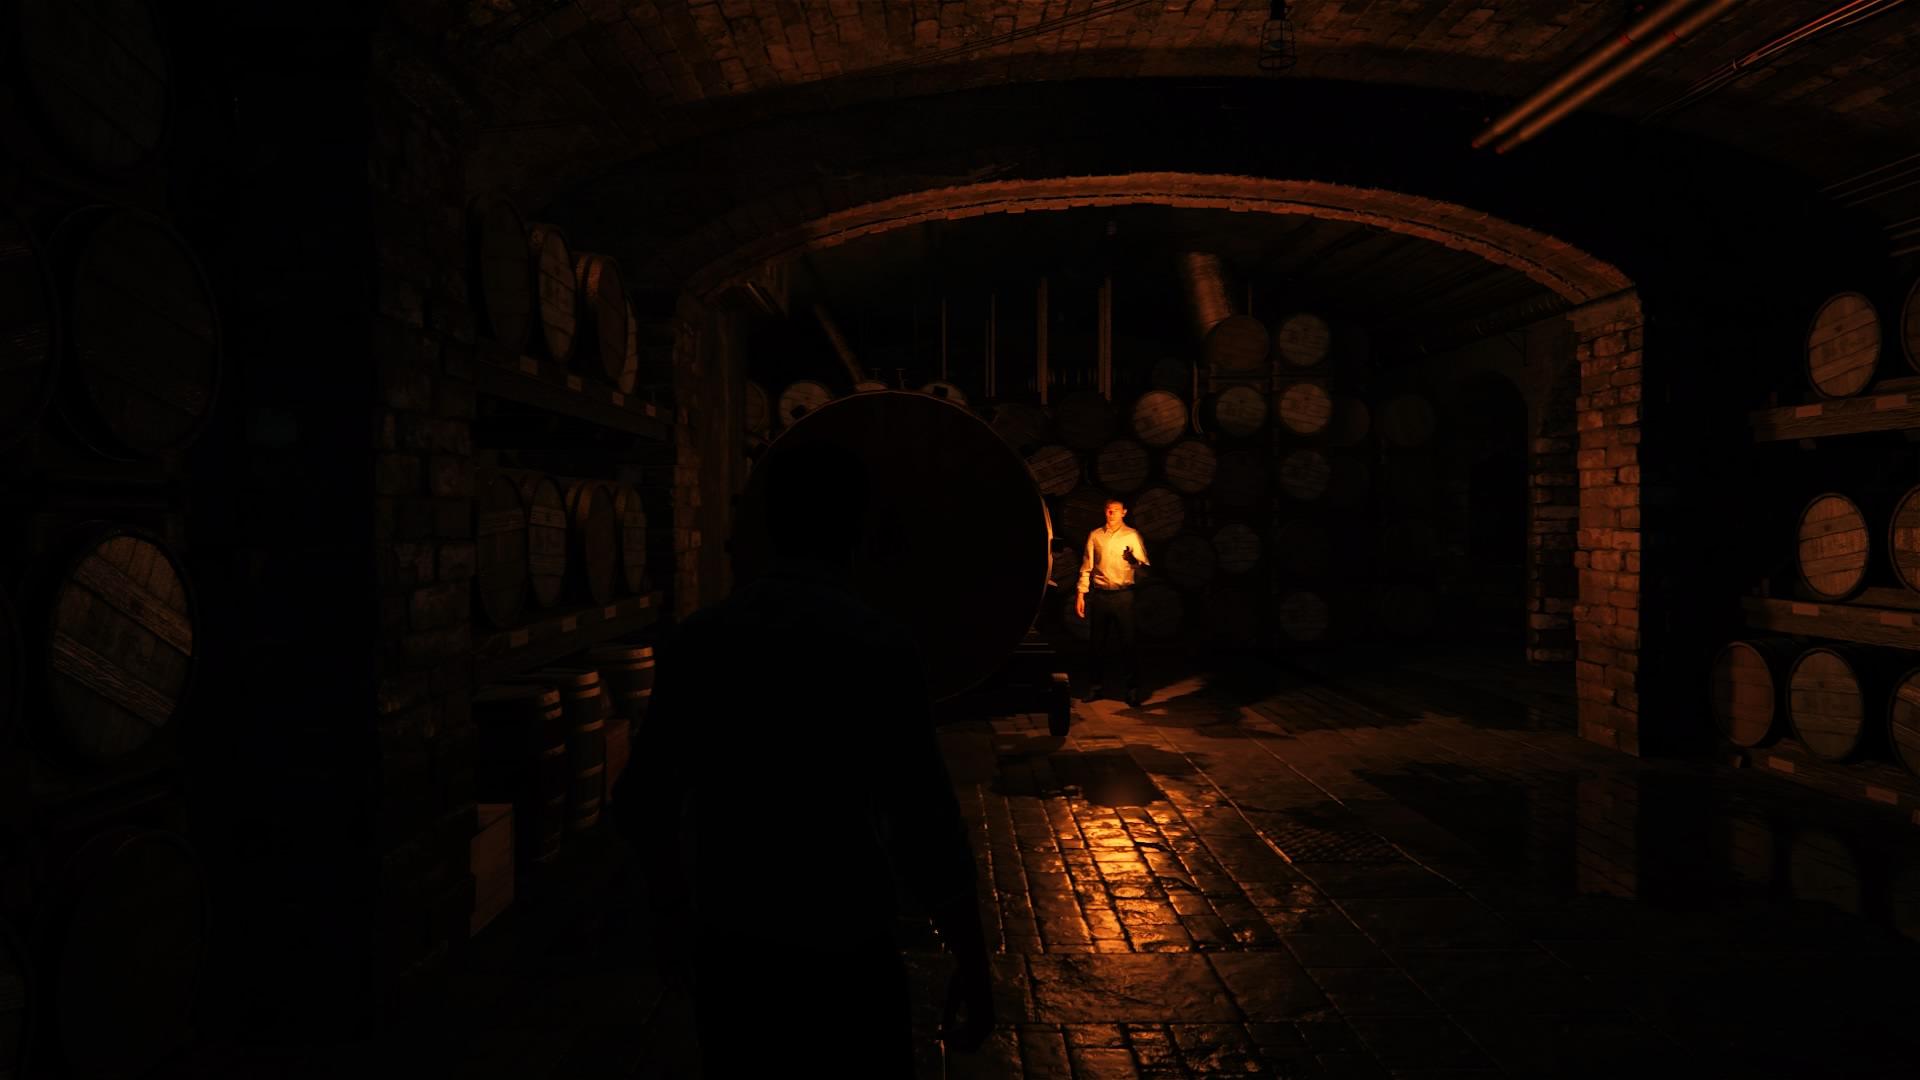 uncharted_4_wine_cellar.jpg